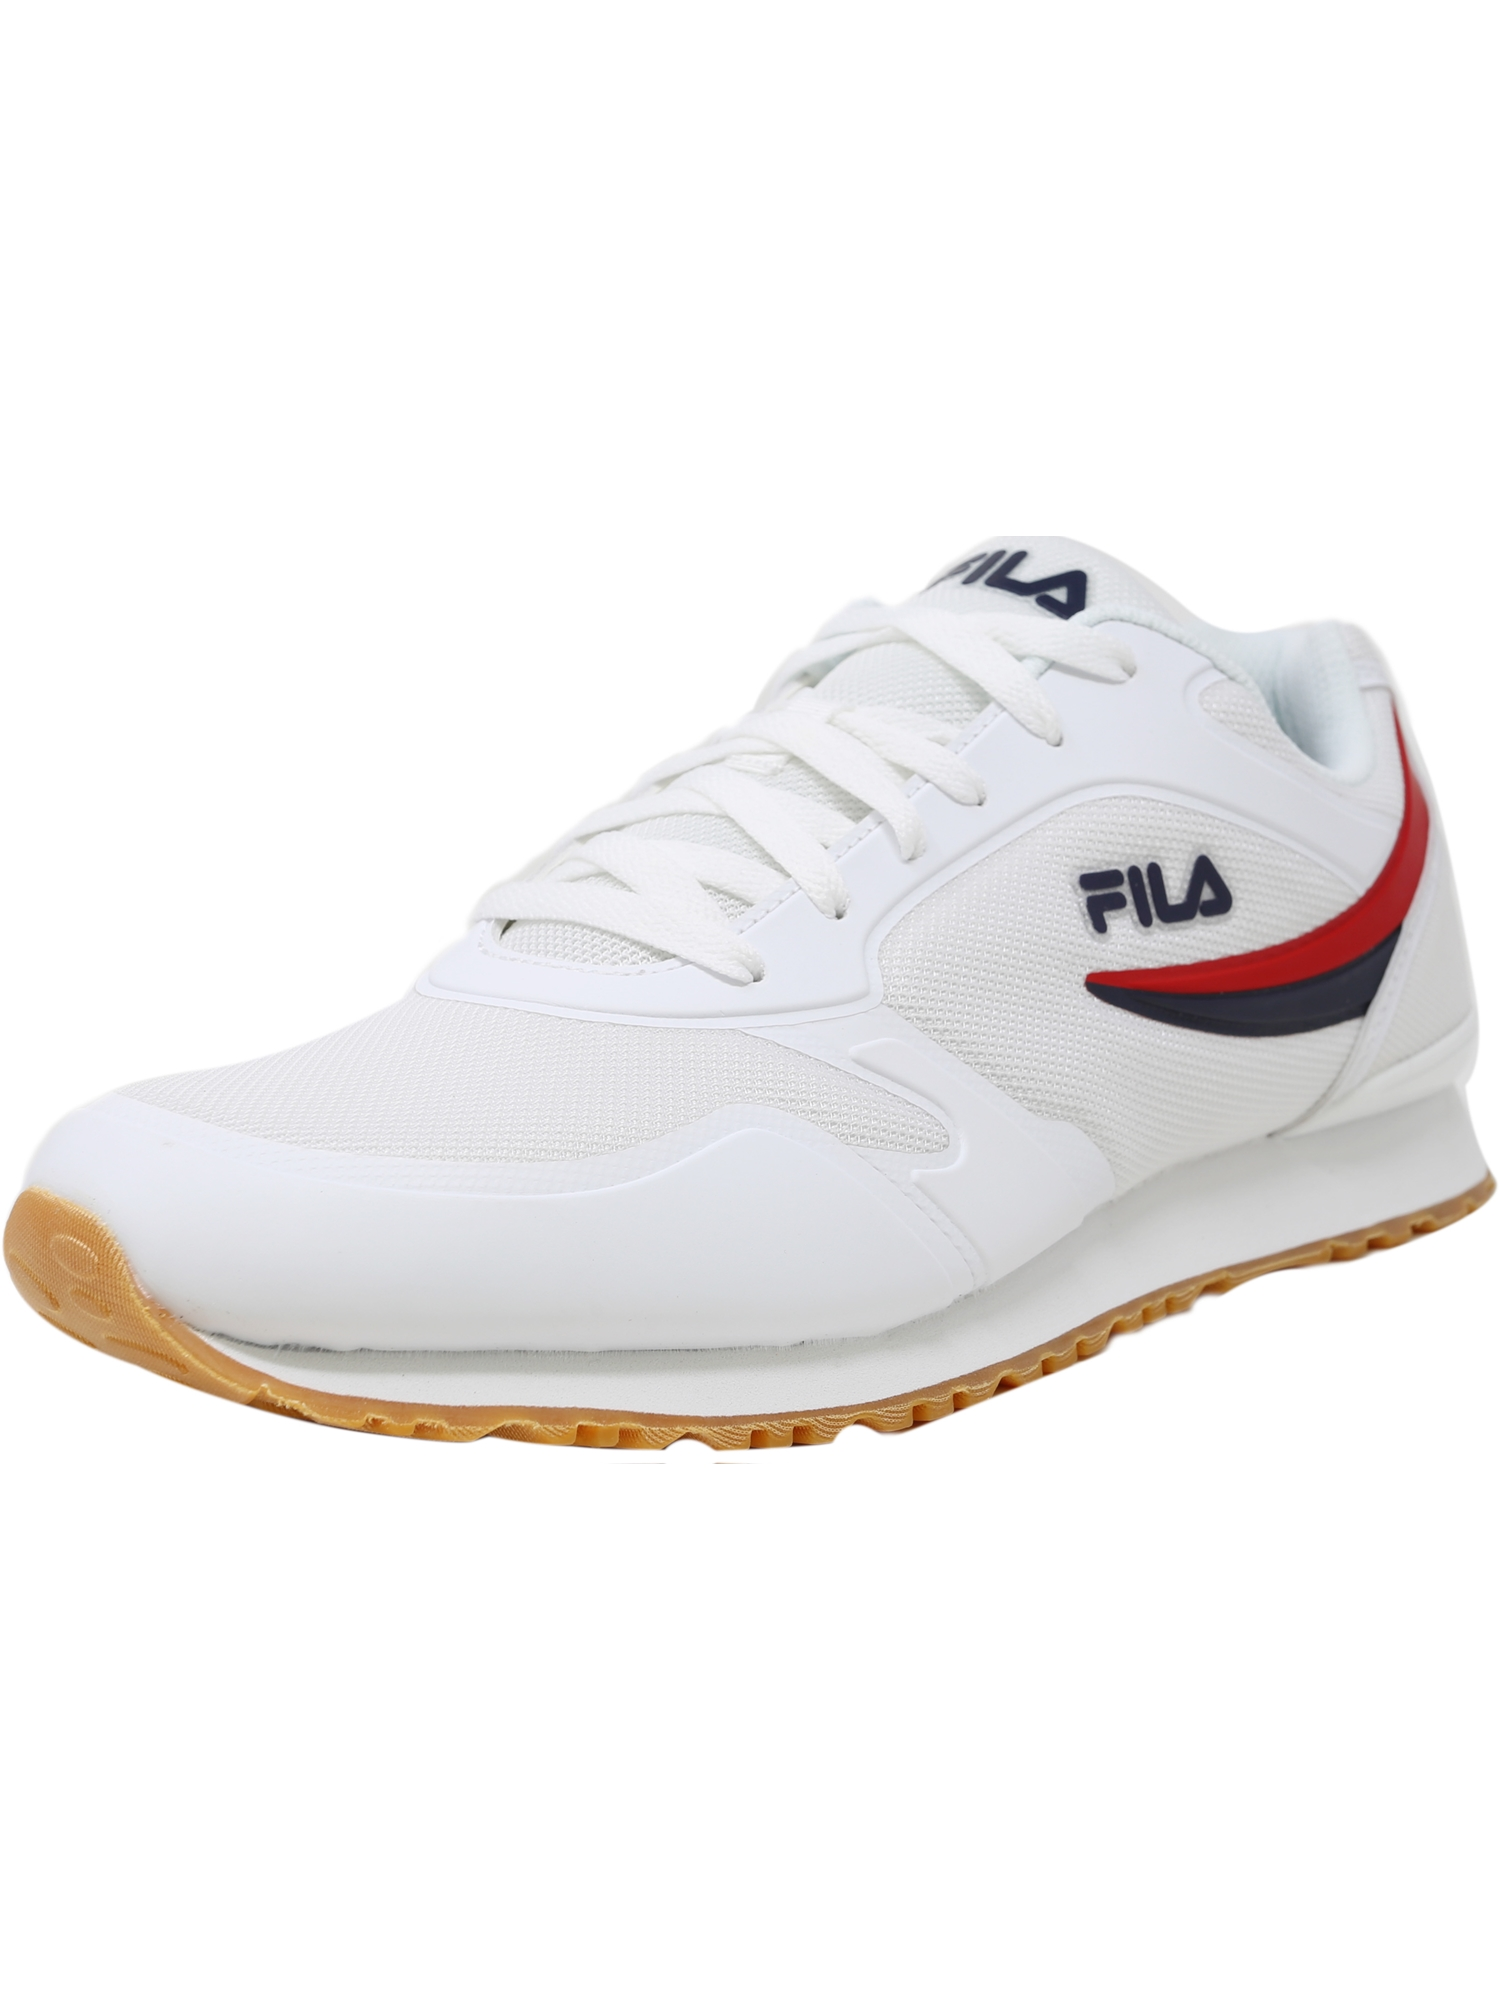 Fila Fila Forerunner 18 Fashion Sneaker 12M White Fila Navy Fila Red